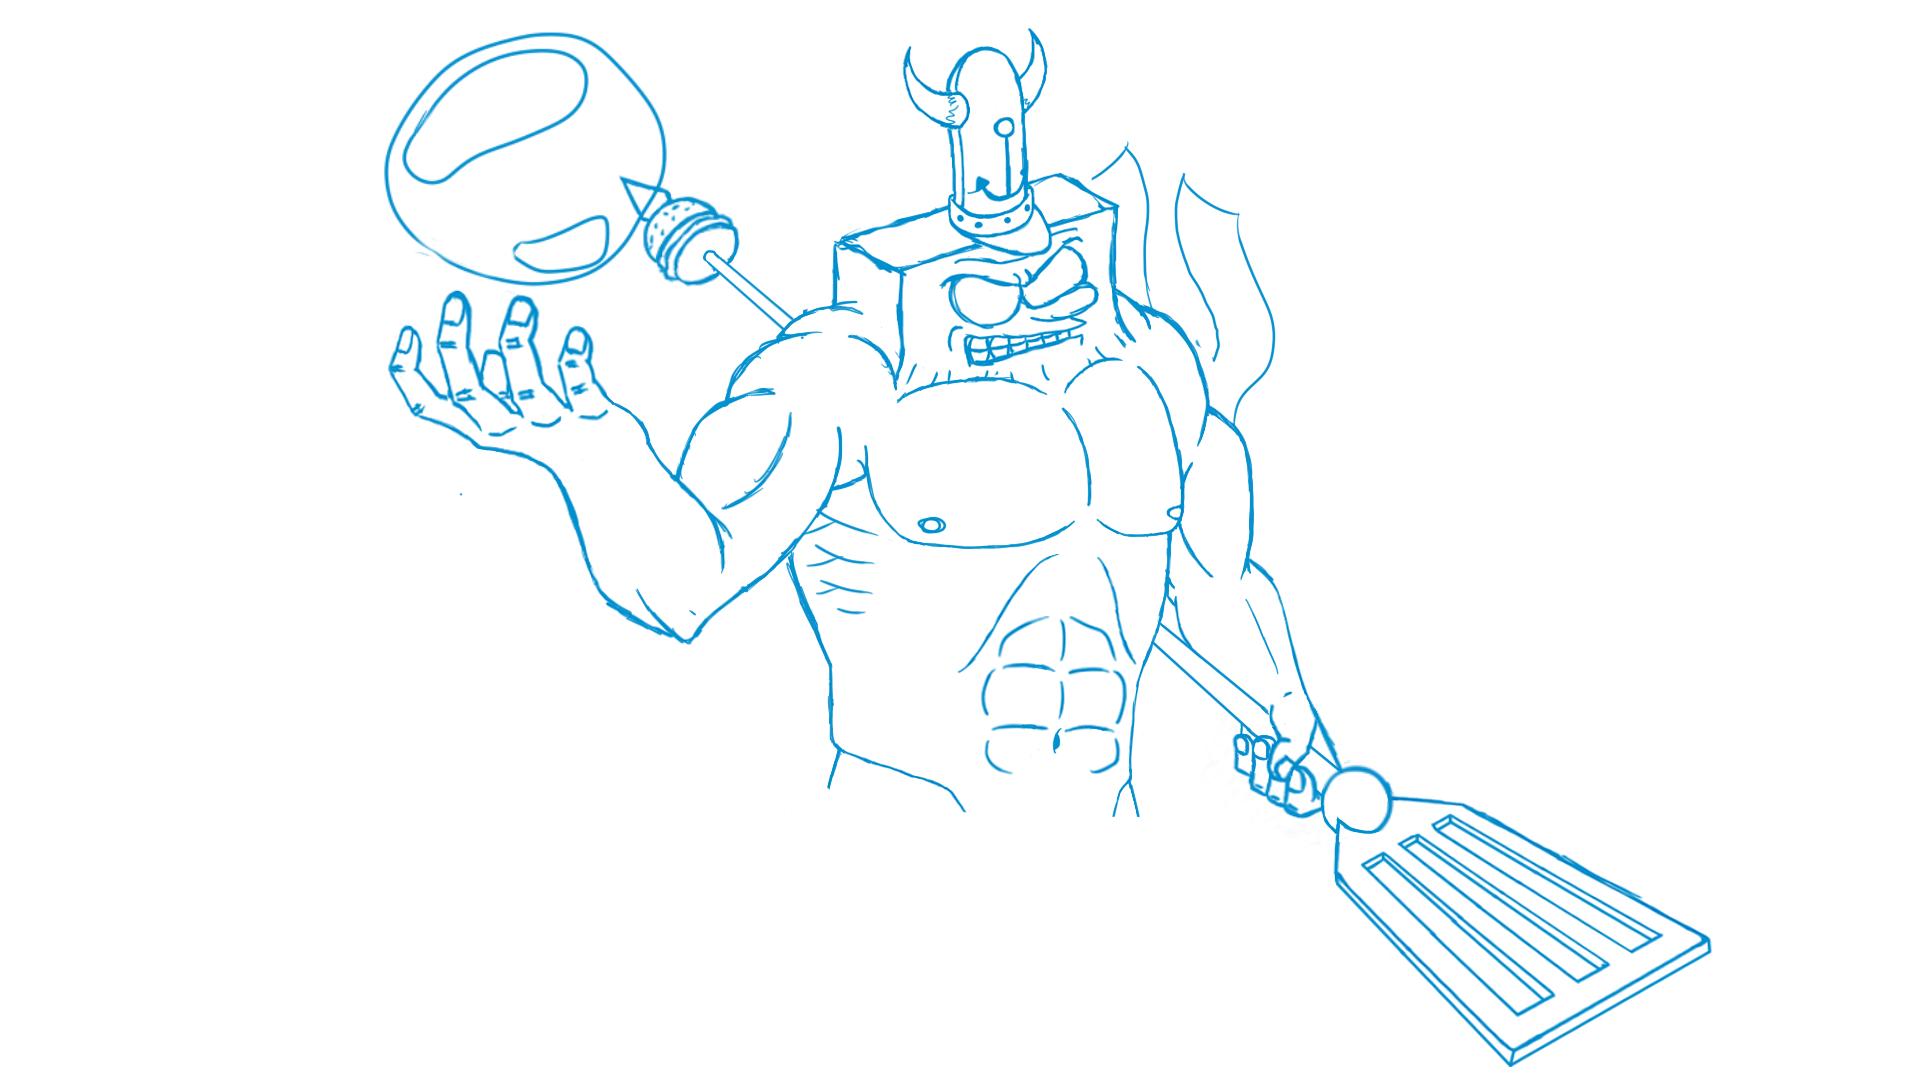 Spongebob Lvl 99 (Sketch)